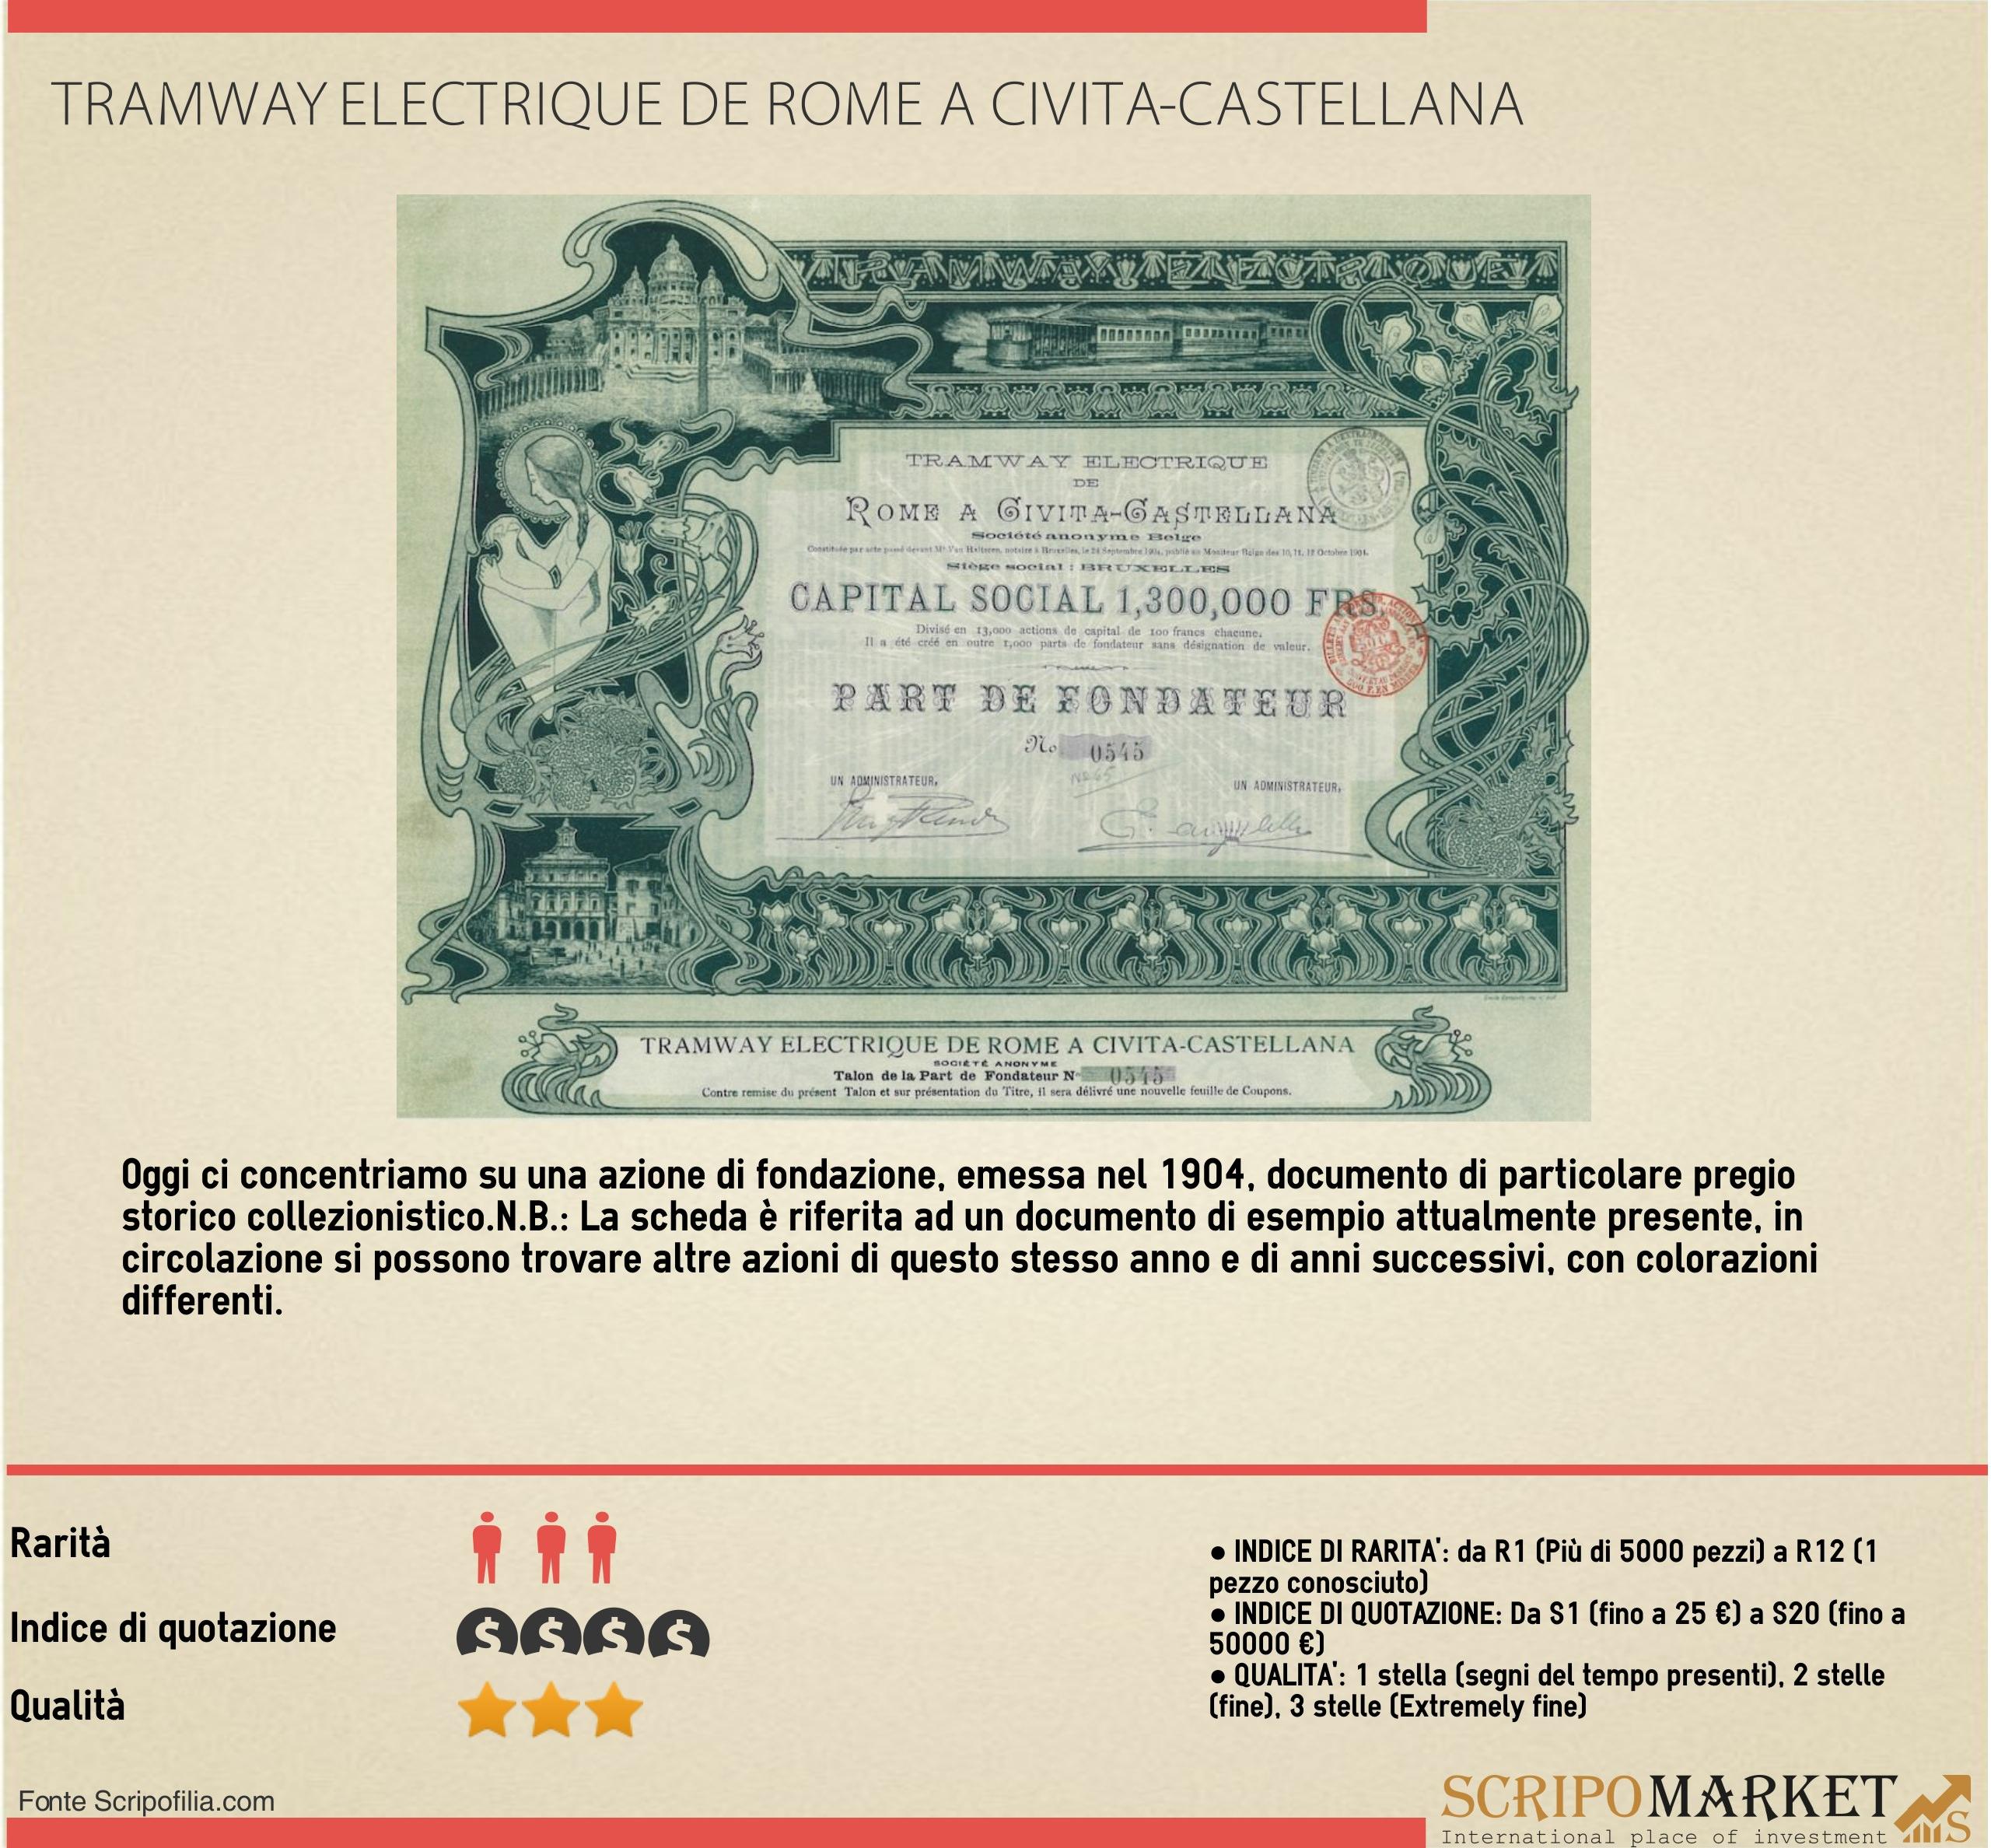 tramwayelectriquederomeacivitacastellana